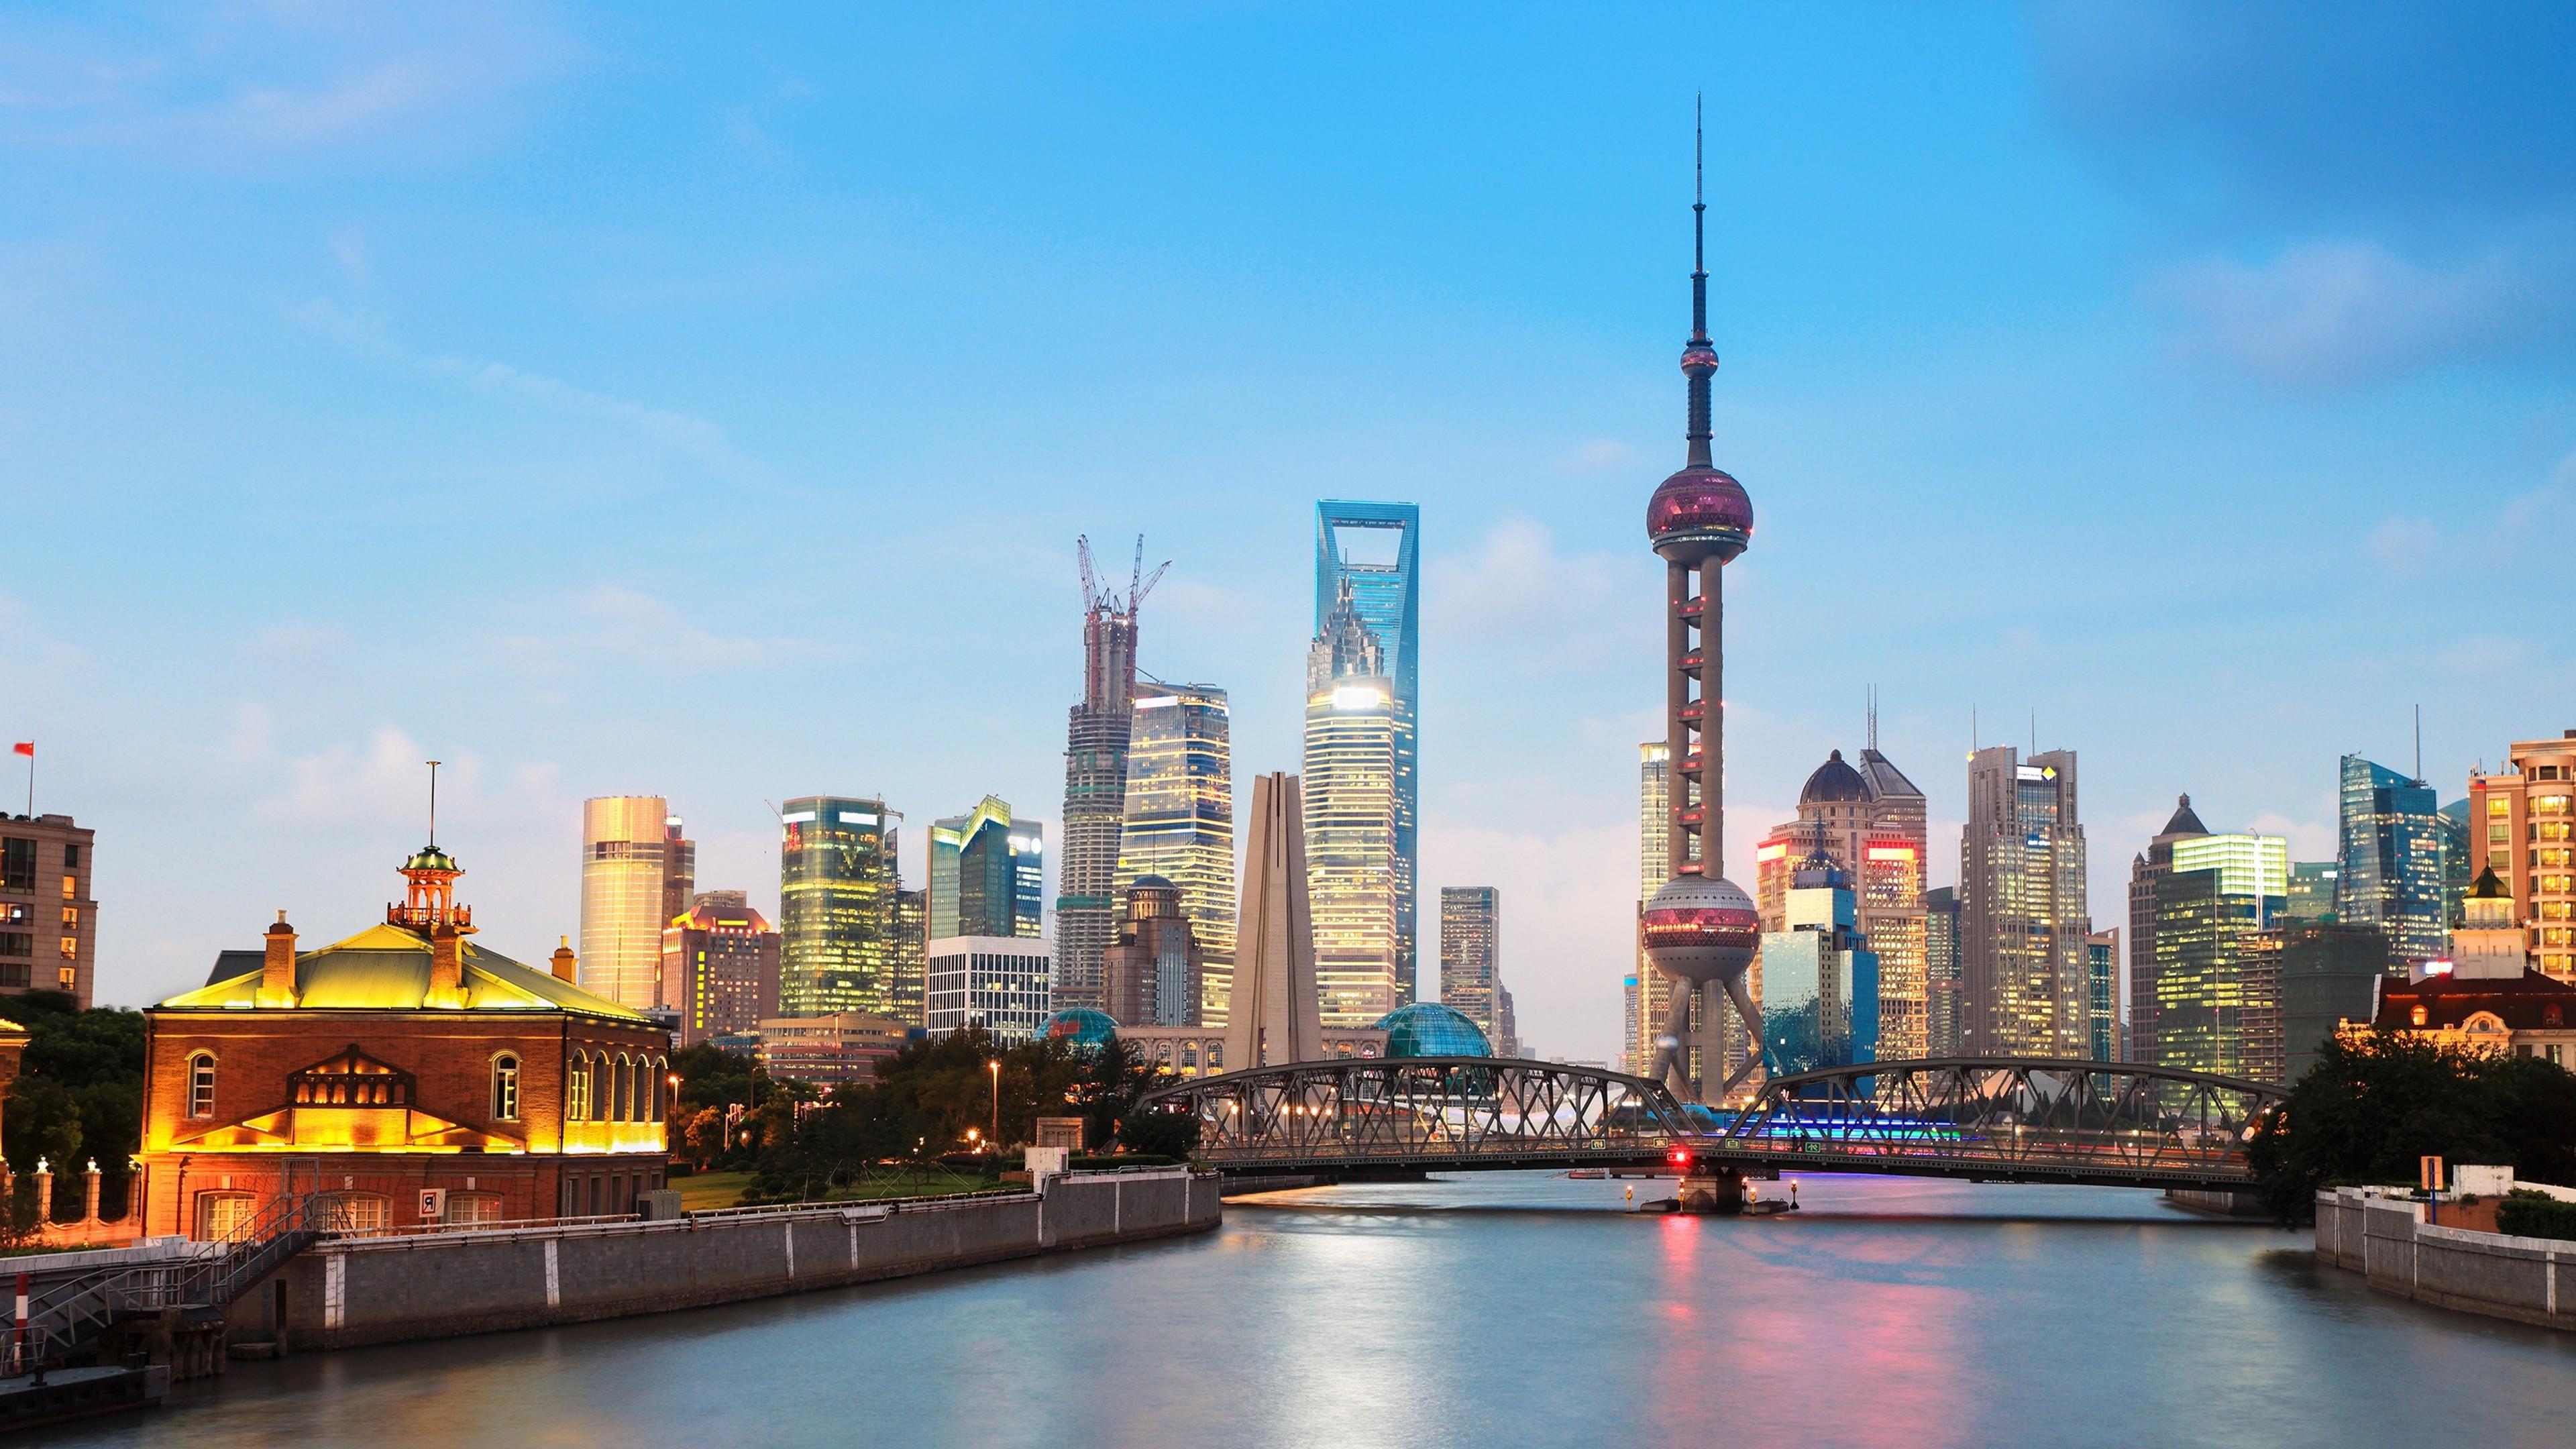 shanghai cityscape 1538069020 - Shanghai Cityscape - world wallpapers, shanghai wallpapers, nature wallpapers, cityscape wallpapers